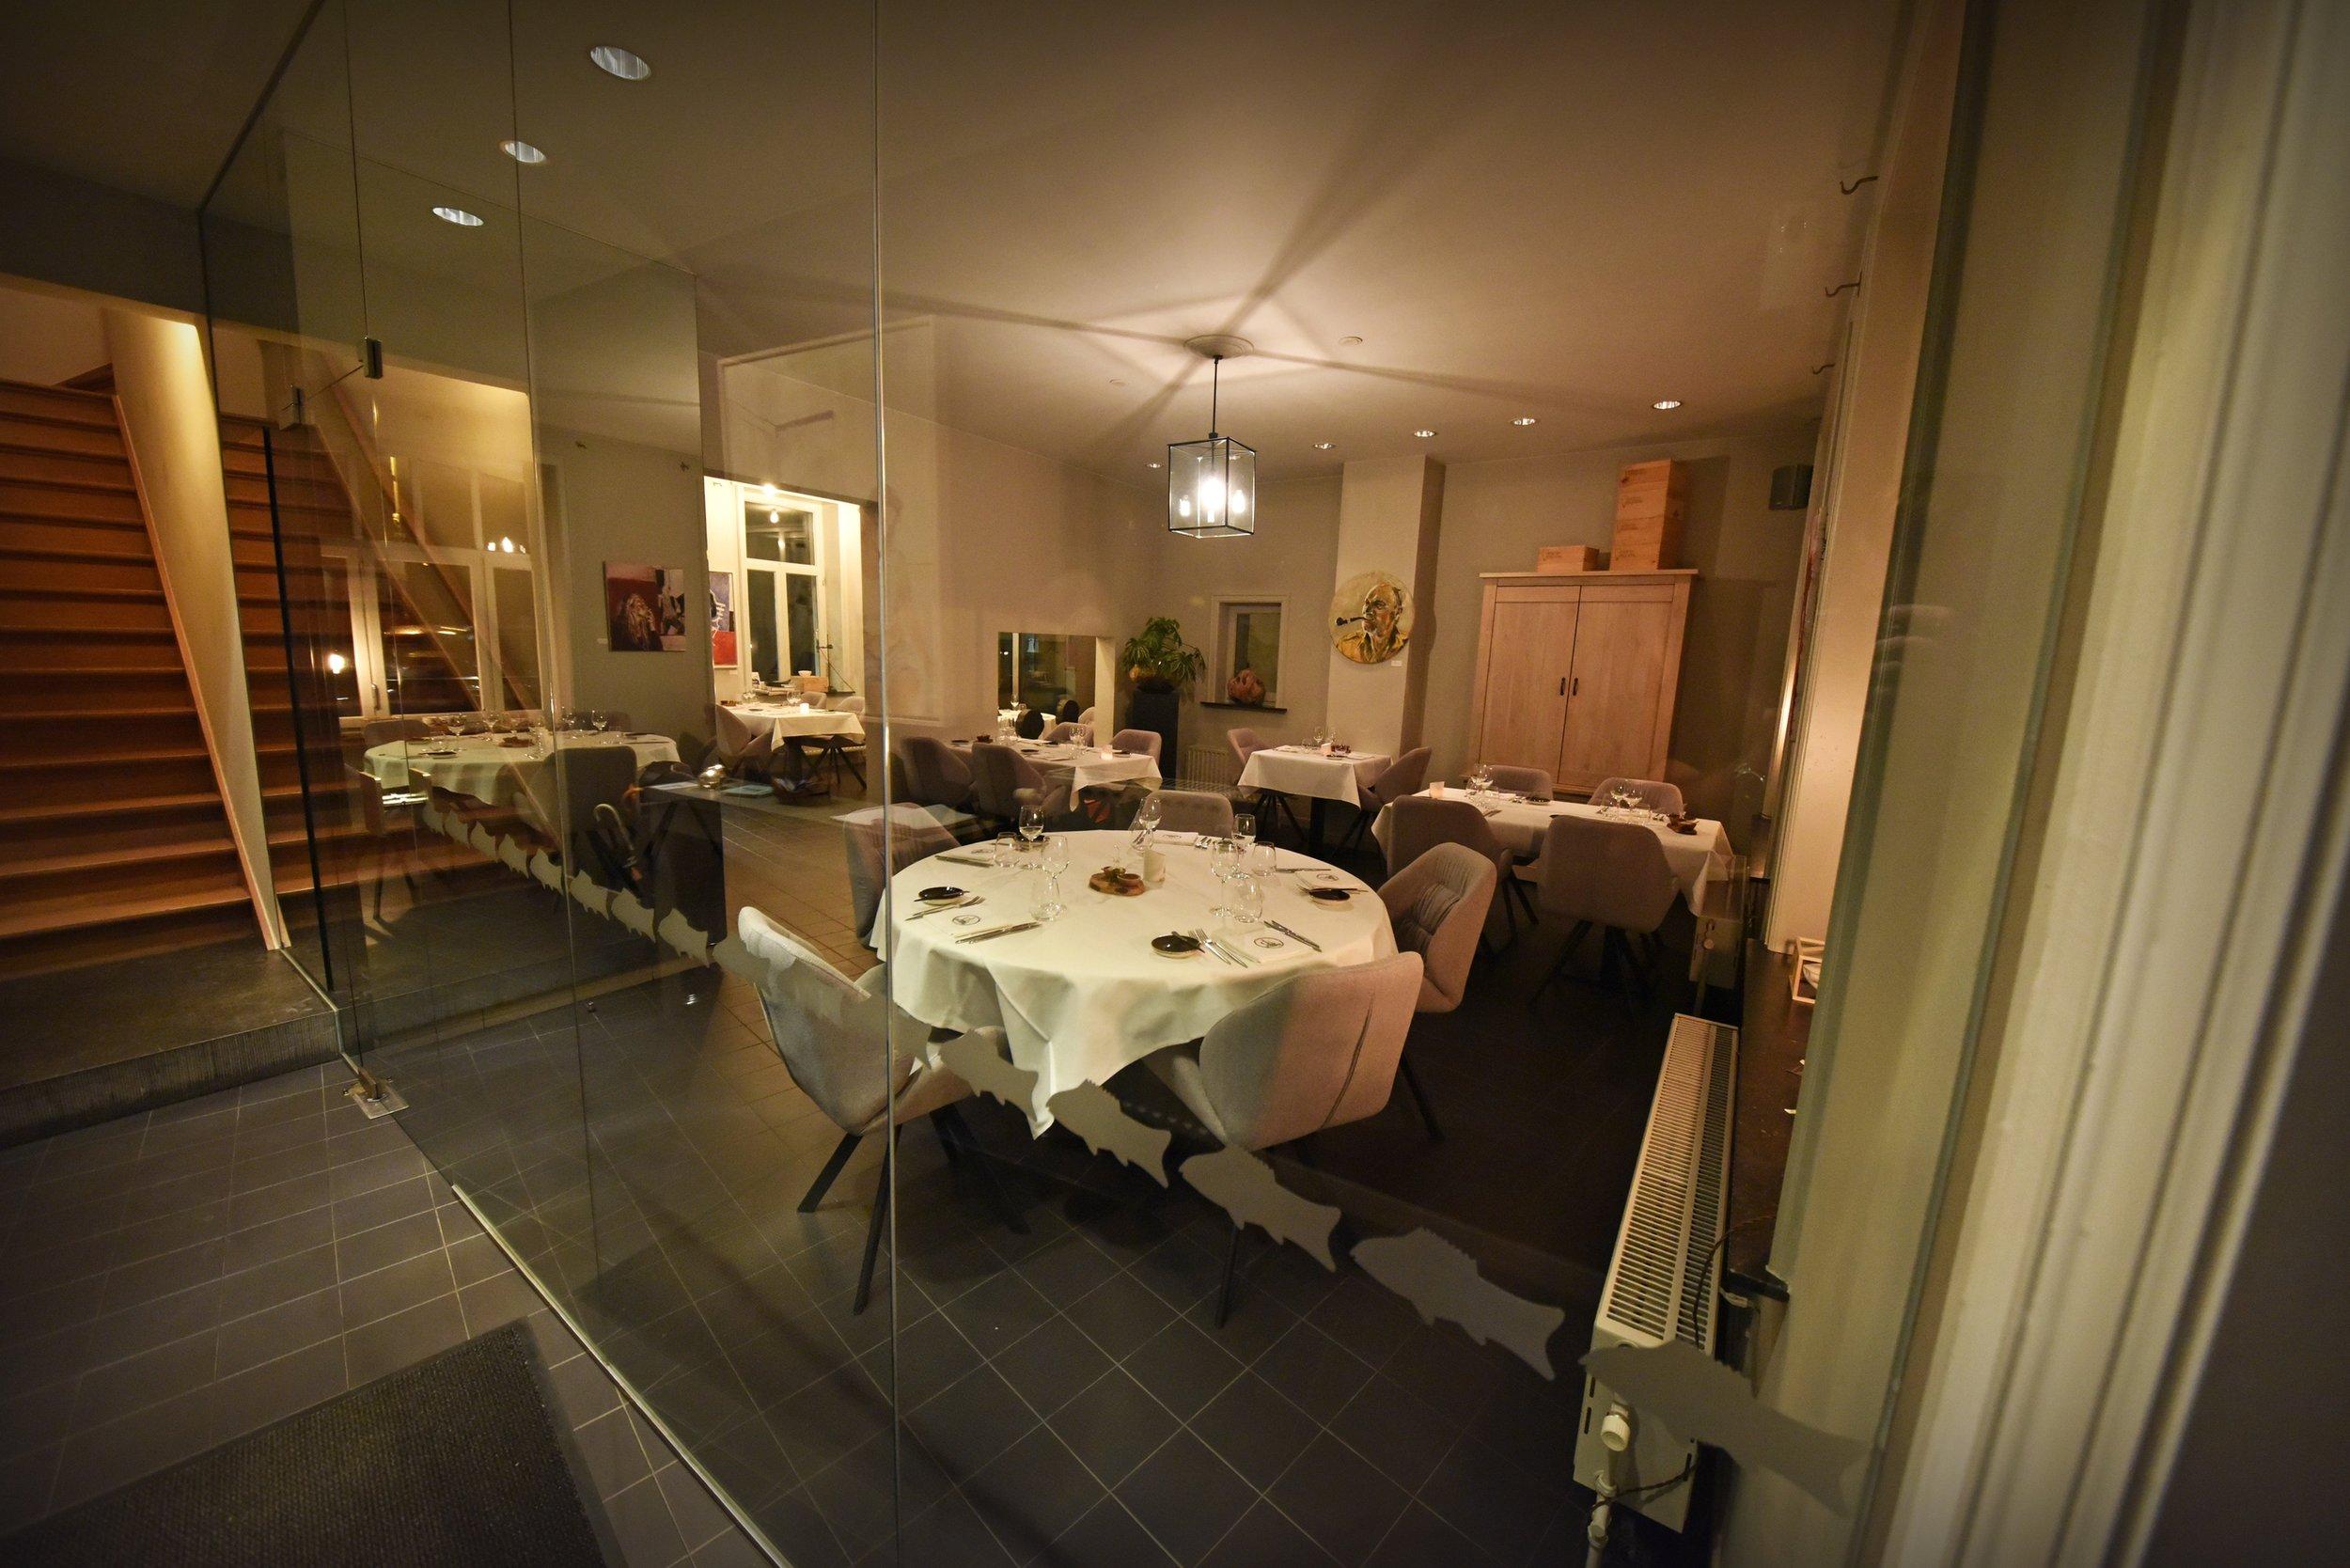 18 restaurant de karper bart albrecht tablefever machelen.jpg.jpg